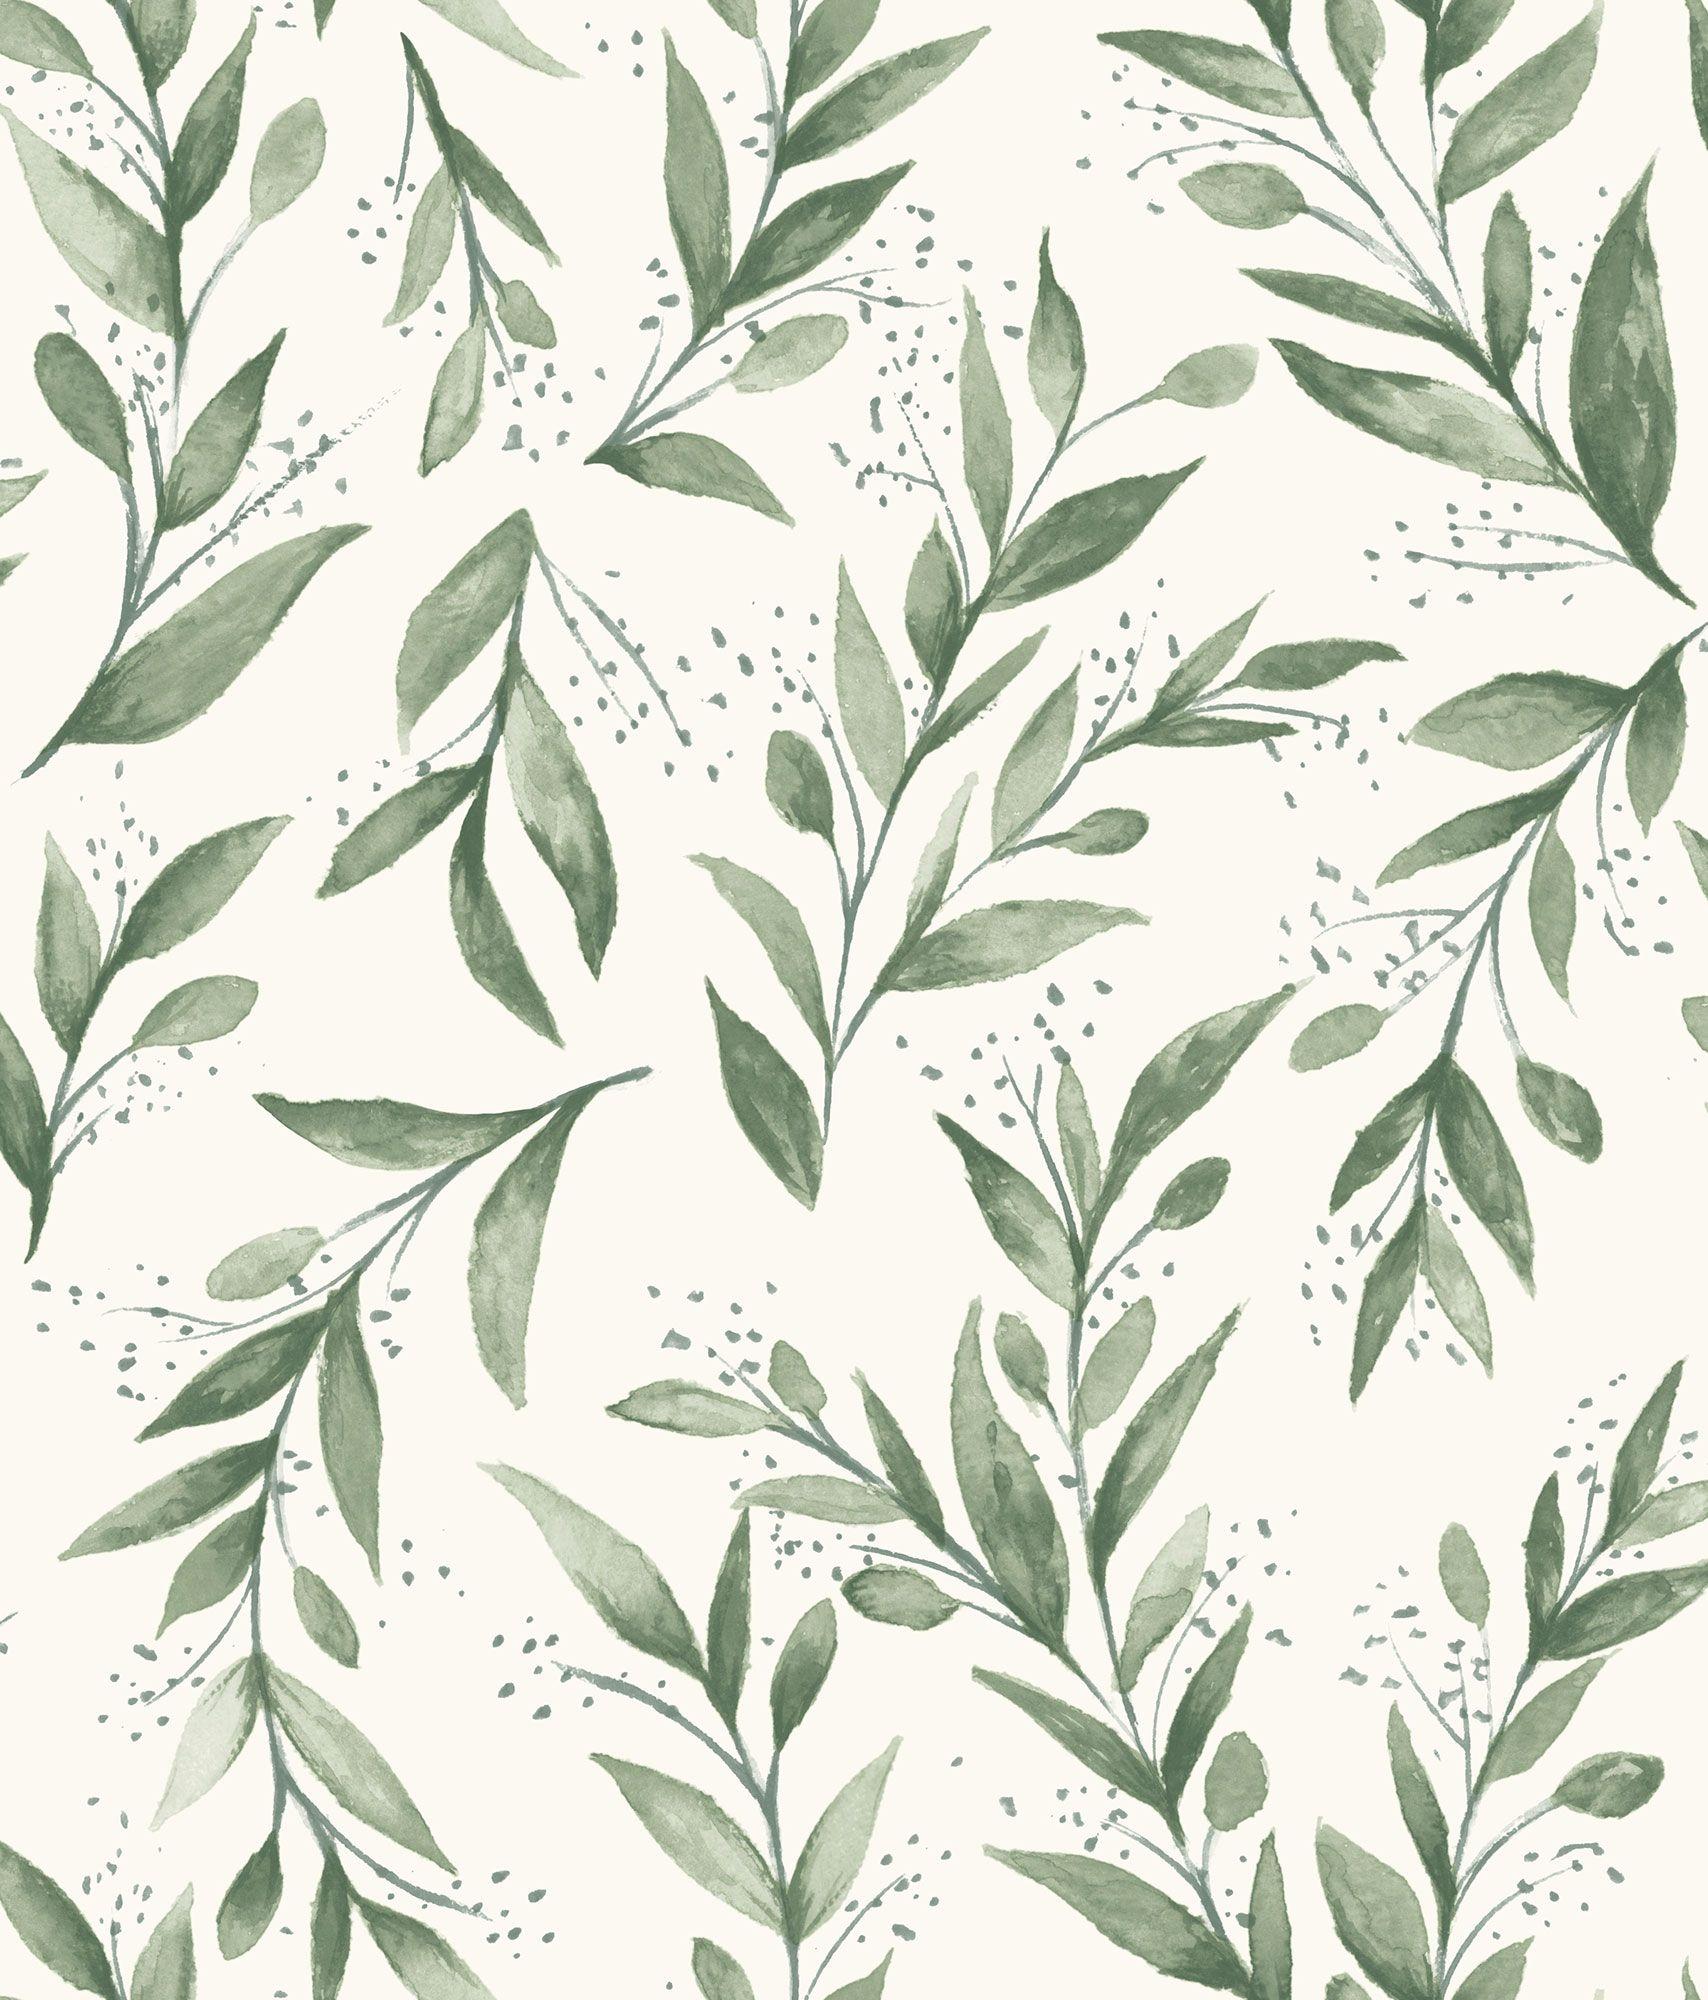 Magnolia Home PickUp Sticks Wallpaper Navy, White in